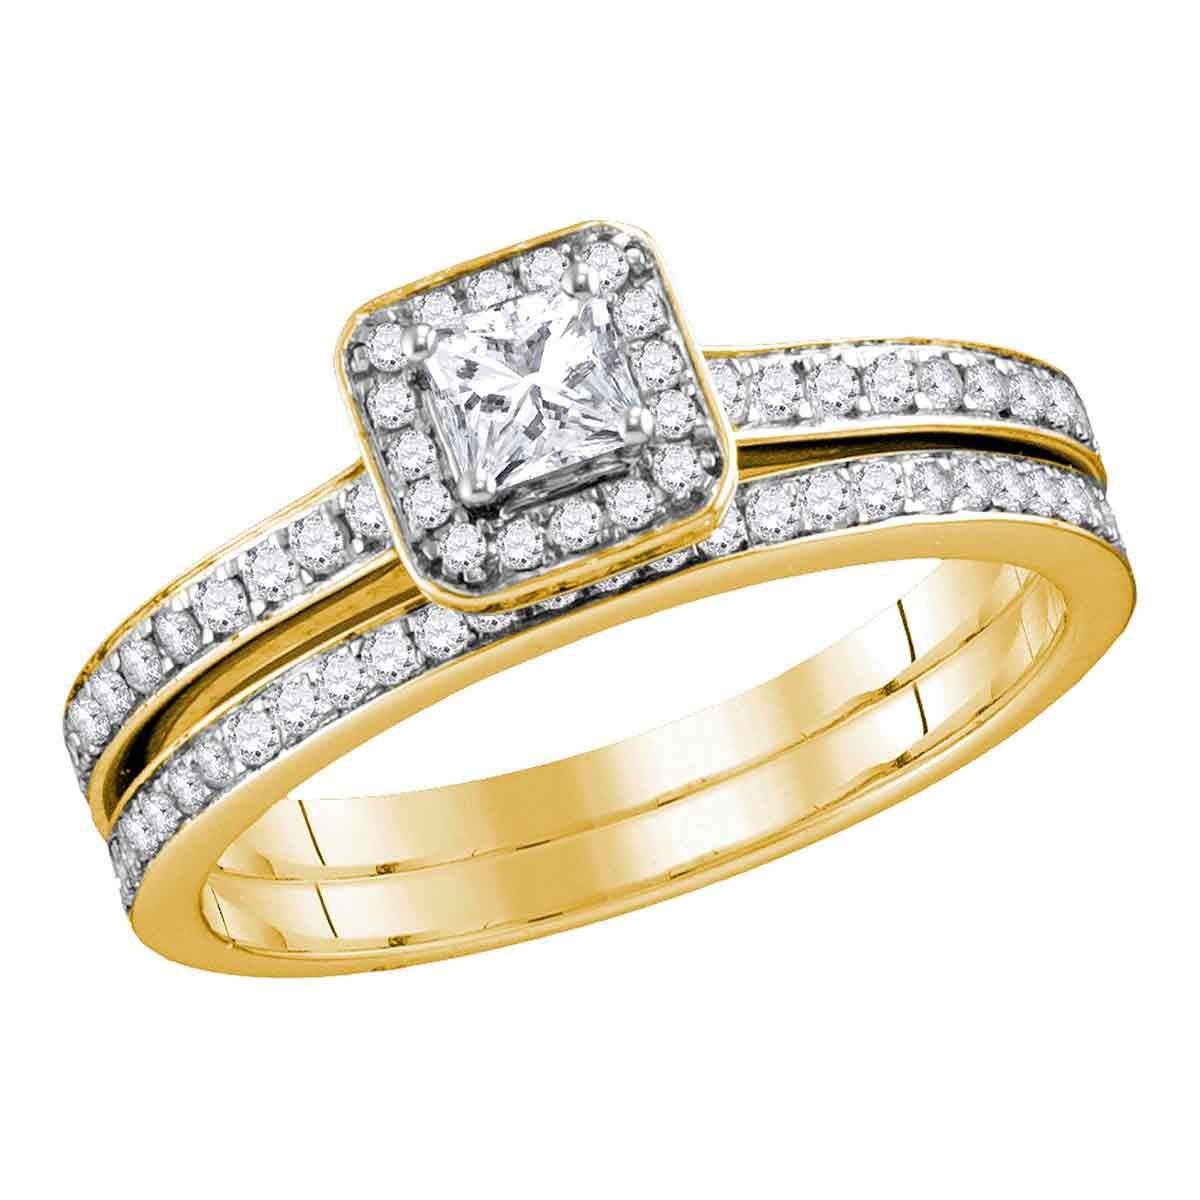 10kt Yellow Gold Womens Princess Diamond Bridal Wedding Engagement Ring Band Set 5/8 Cttw